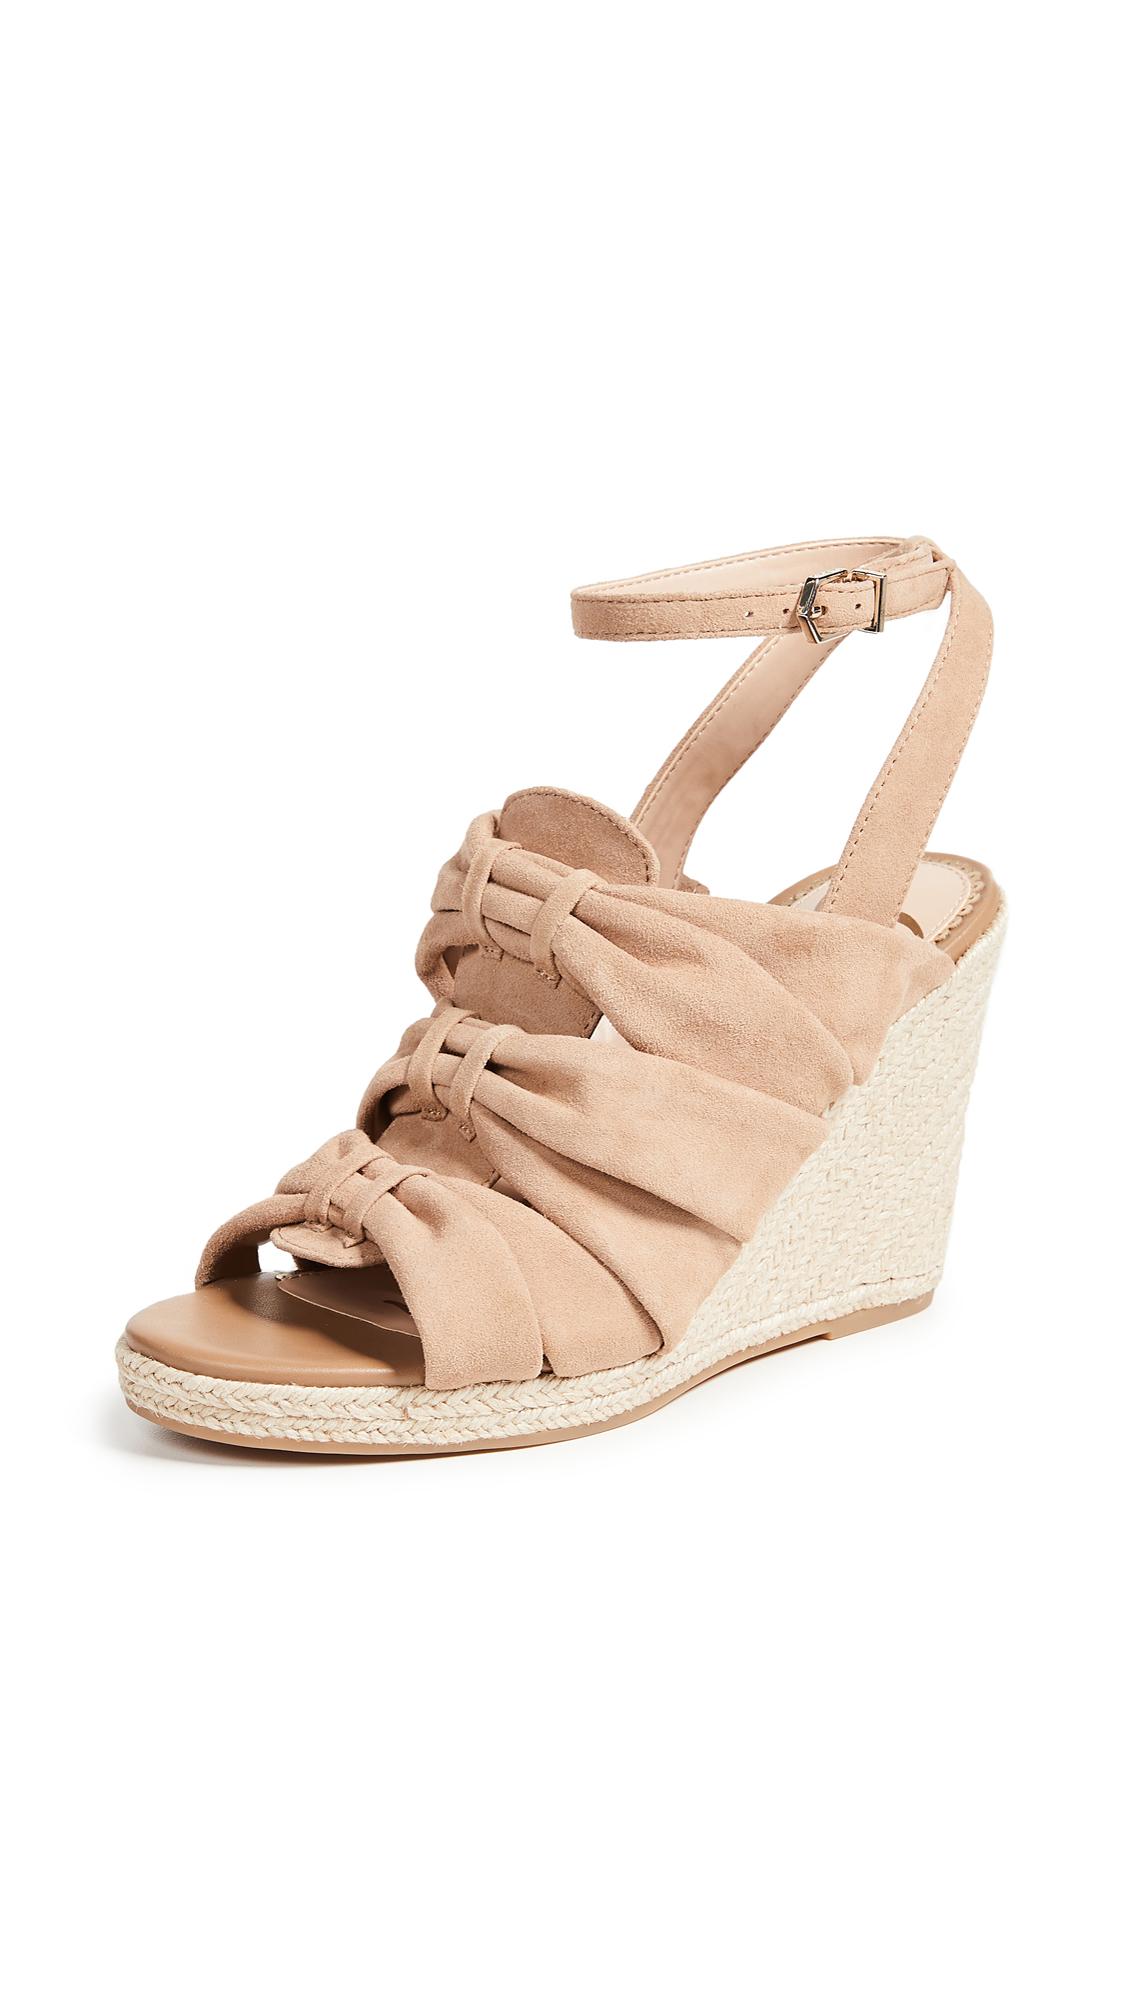 Sam Edelman Awan Wedge Sandals - Golden Caramel